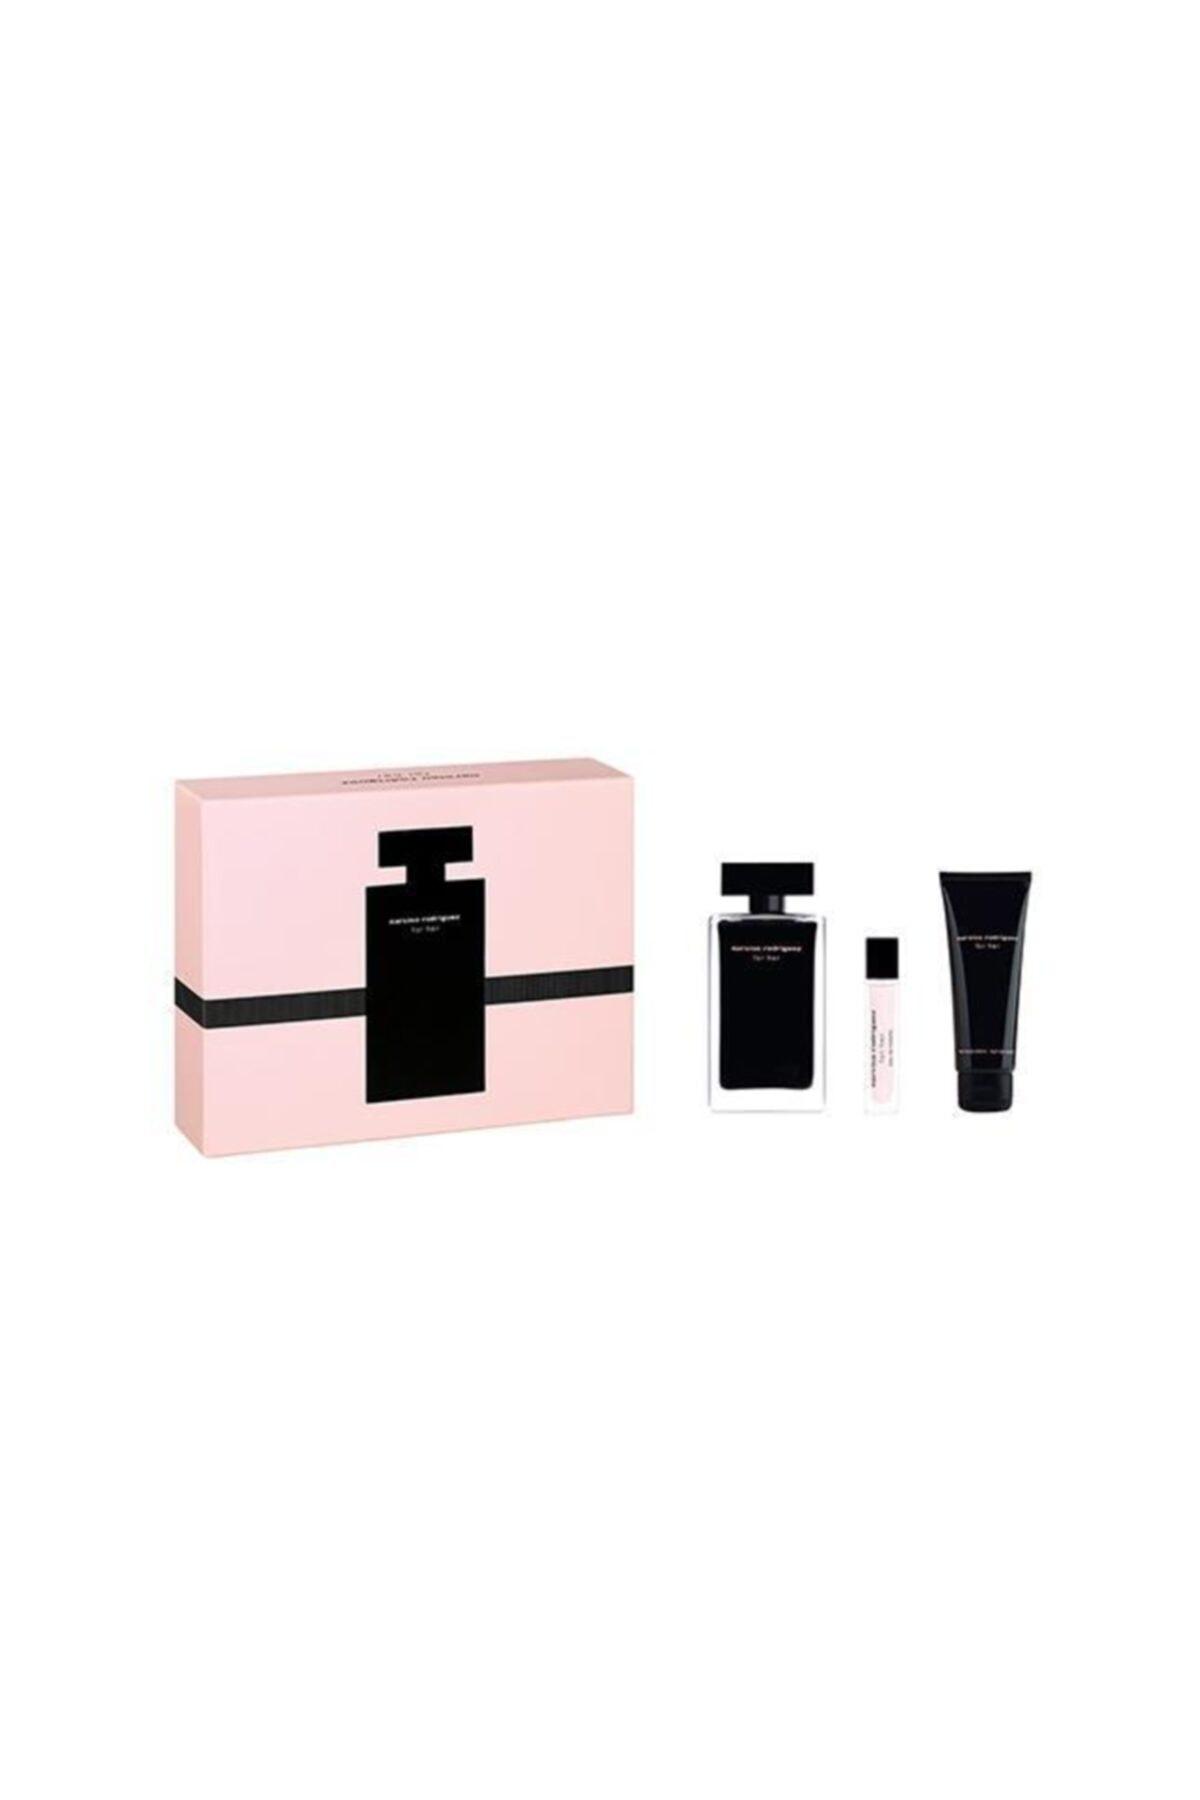 Narciso Rodriguez Edt 100 ml + Body Lotion 75 + Edt 10 Kadın Parfüm Seti 3423478464056 2